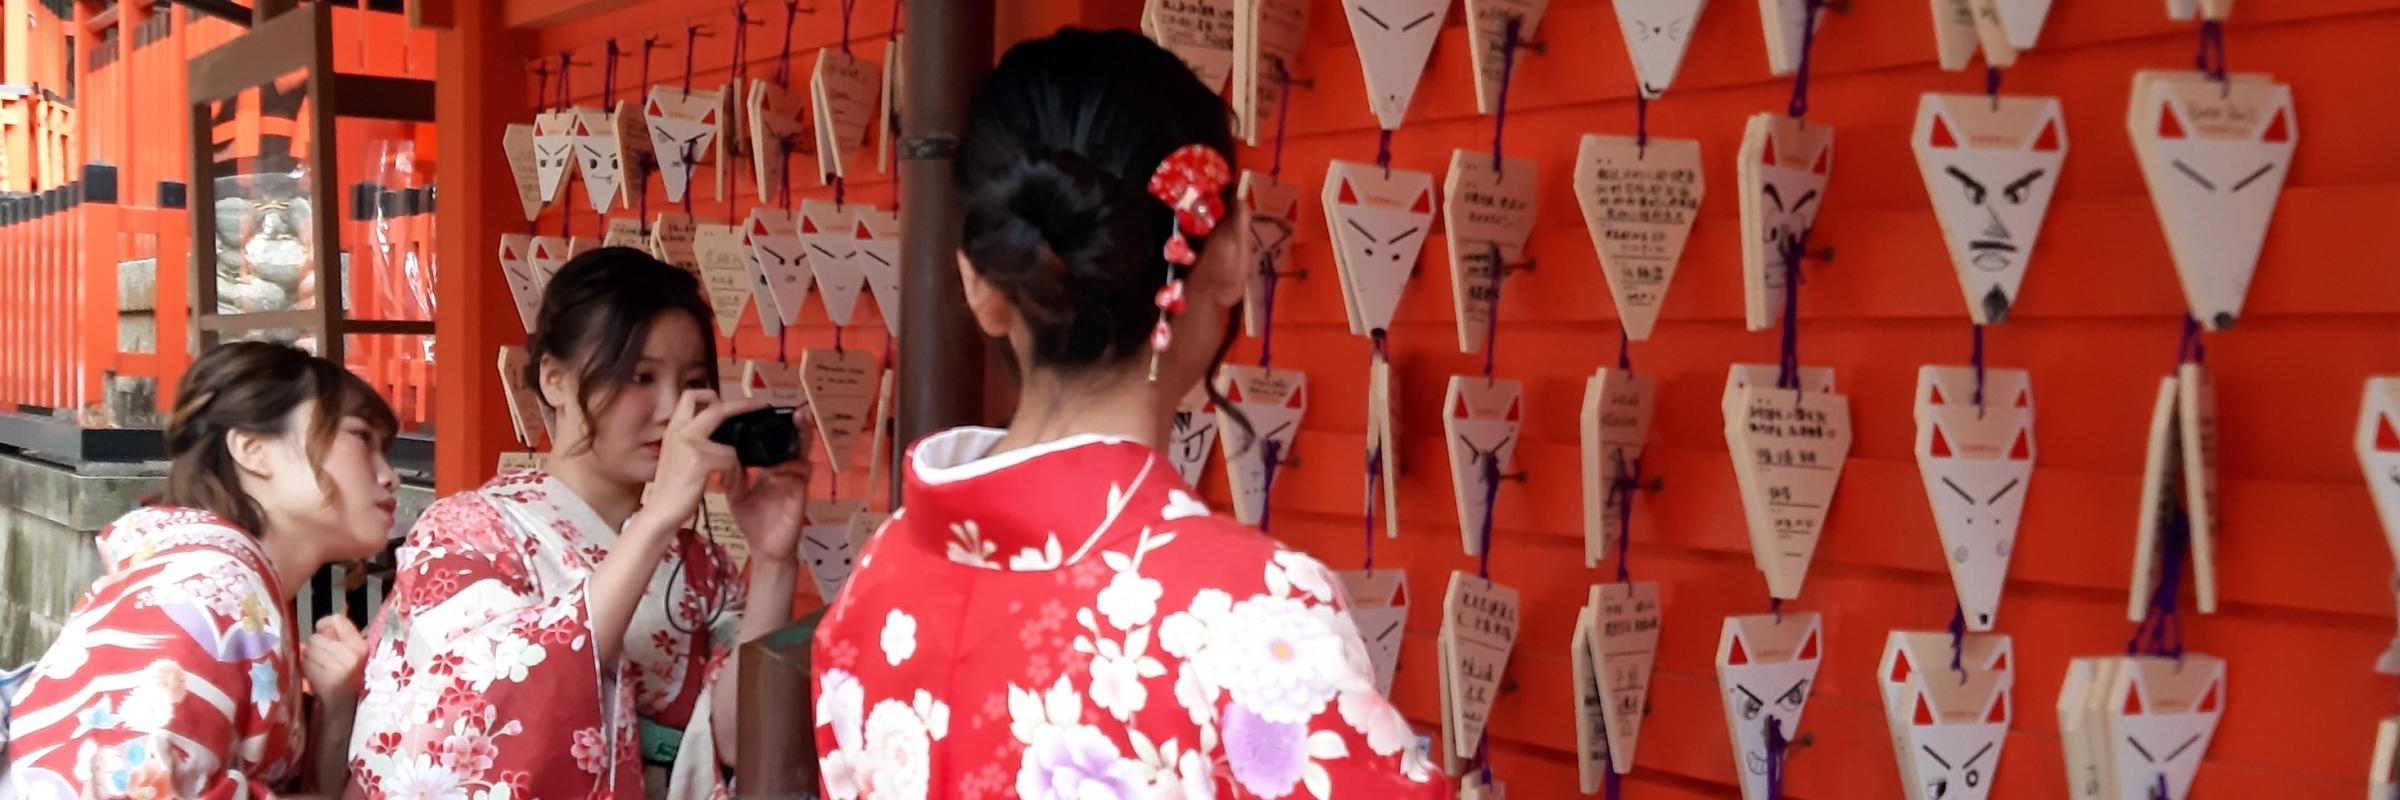 https://gody.vn/blog/tanjiangnan6591/post/muon-ngam-kimono-hay-den-kyoto-1962